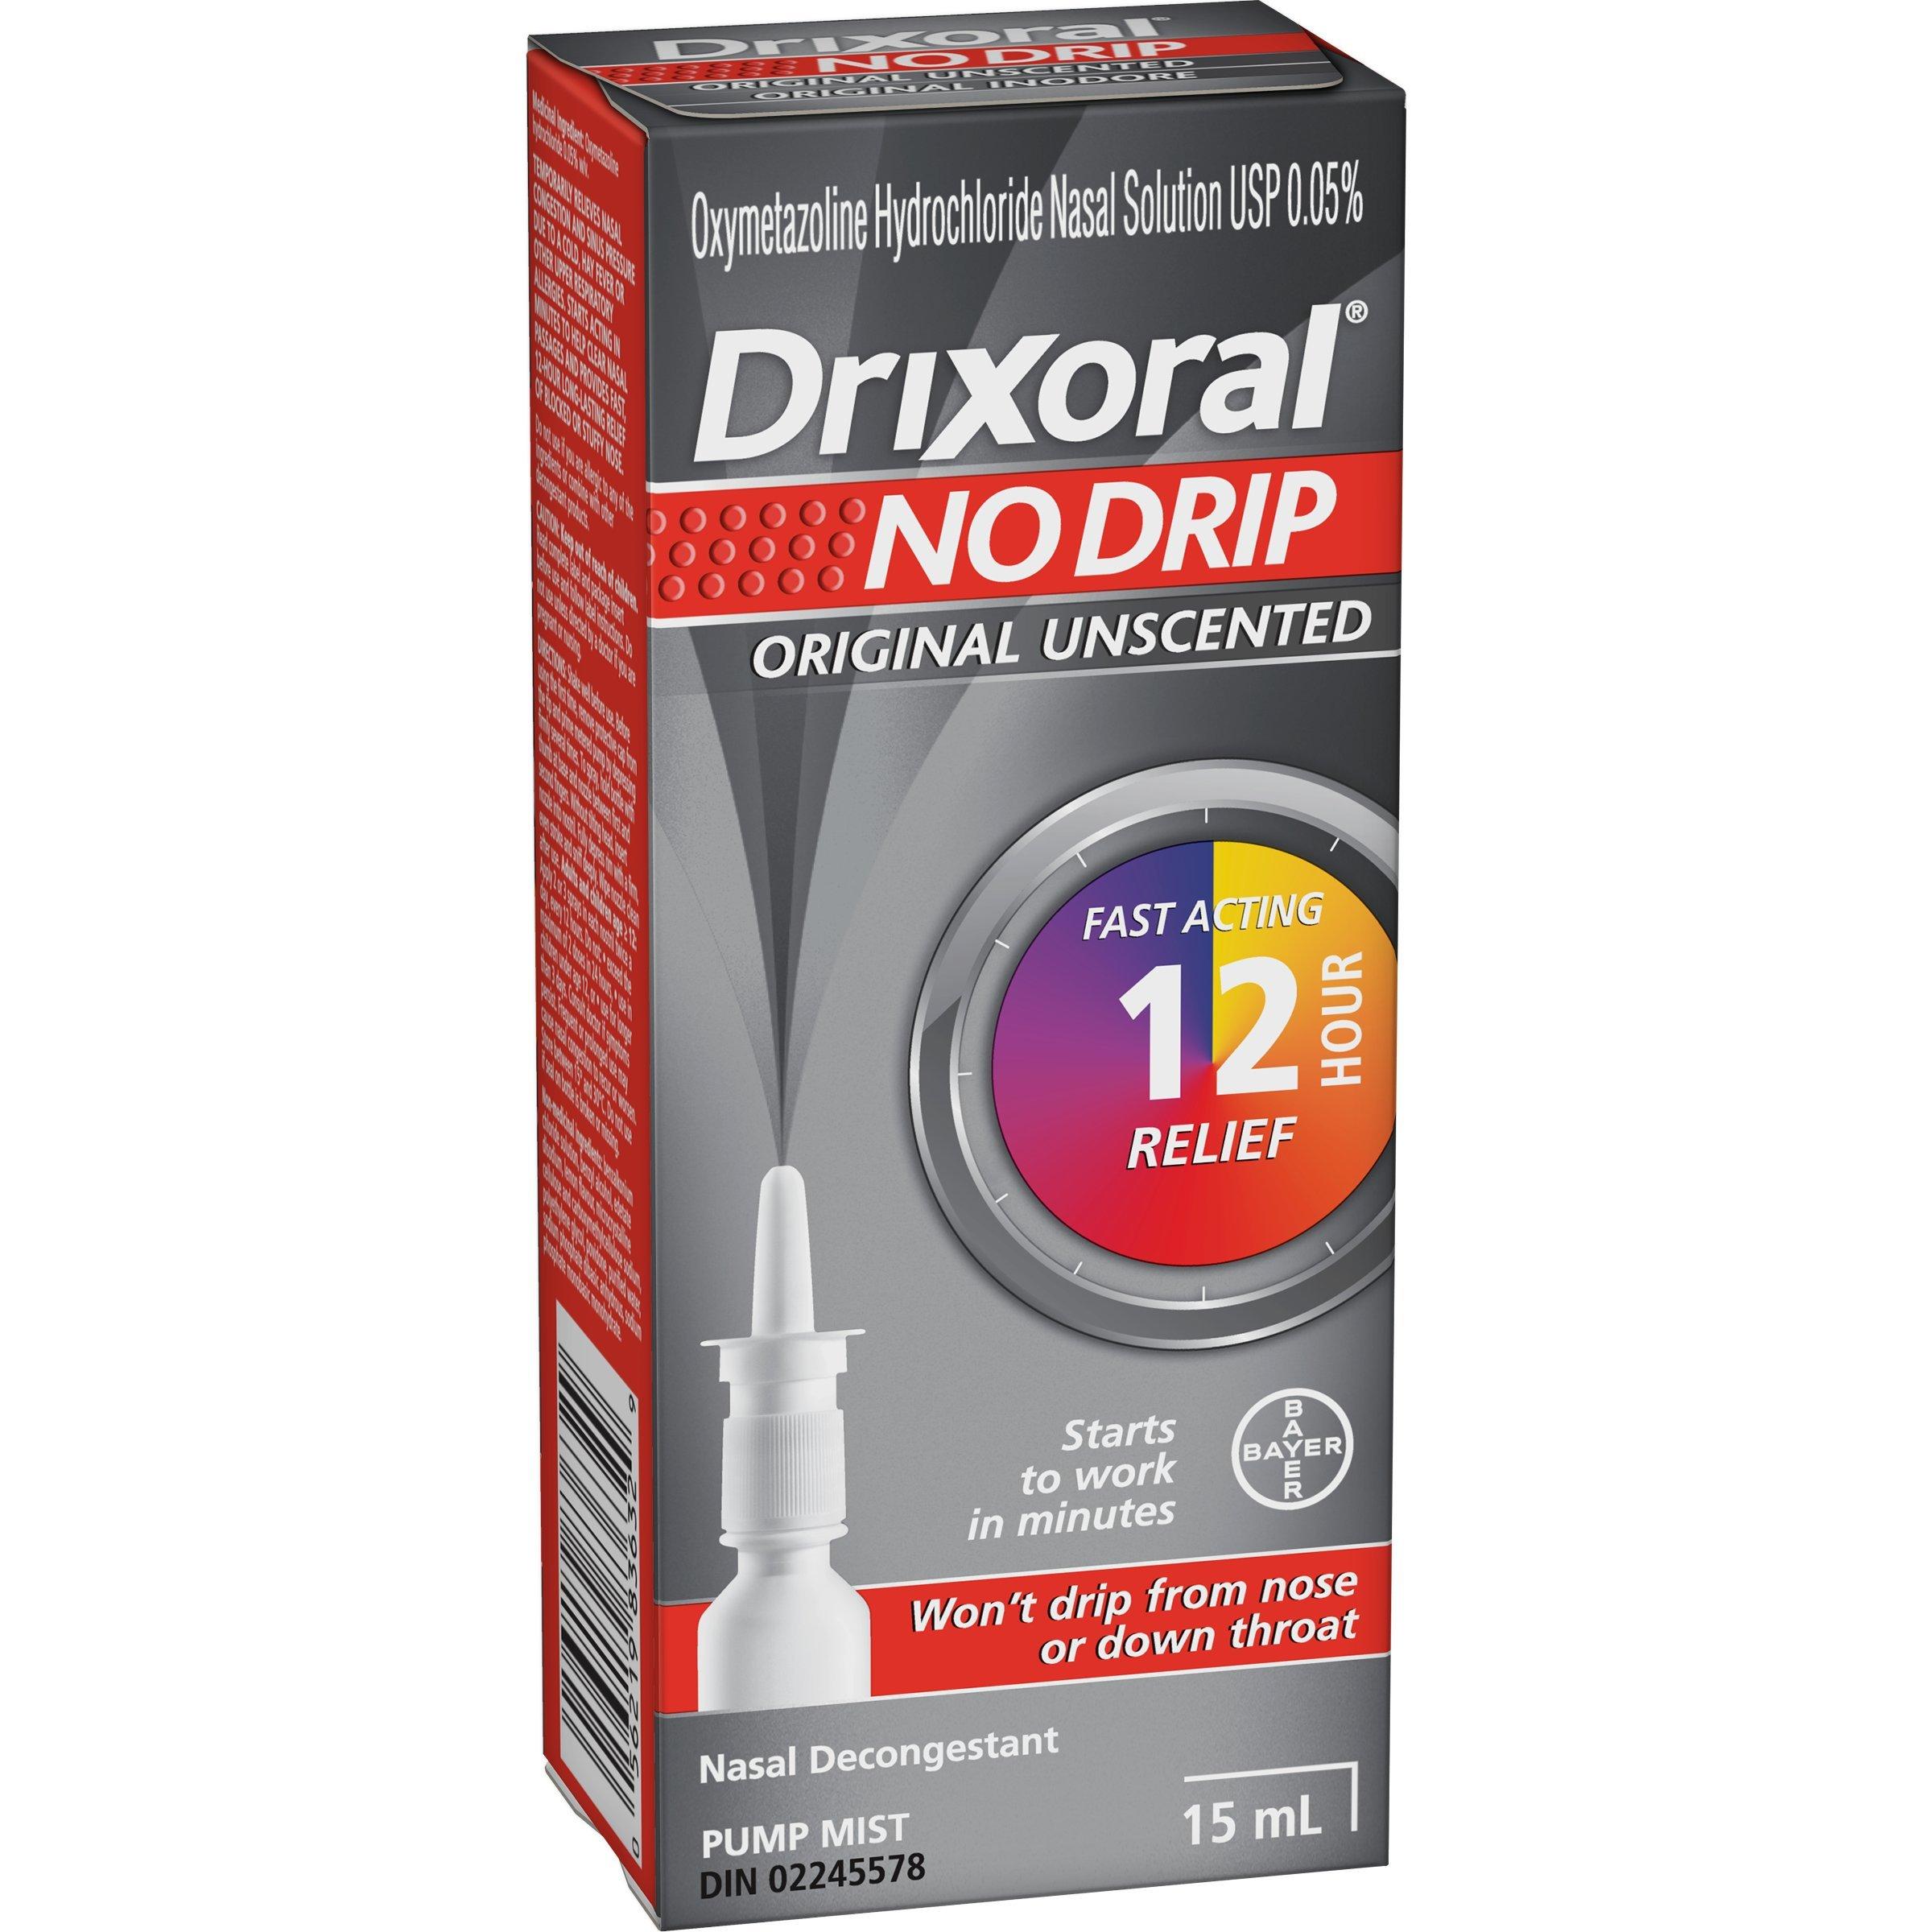 DRIXORAL No Drip 'Original Unscented' NASAL DECONGESTANT Pump Mist 15 ml